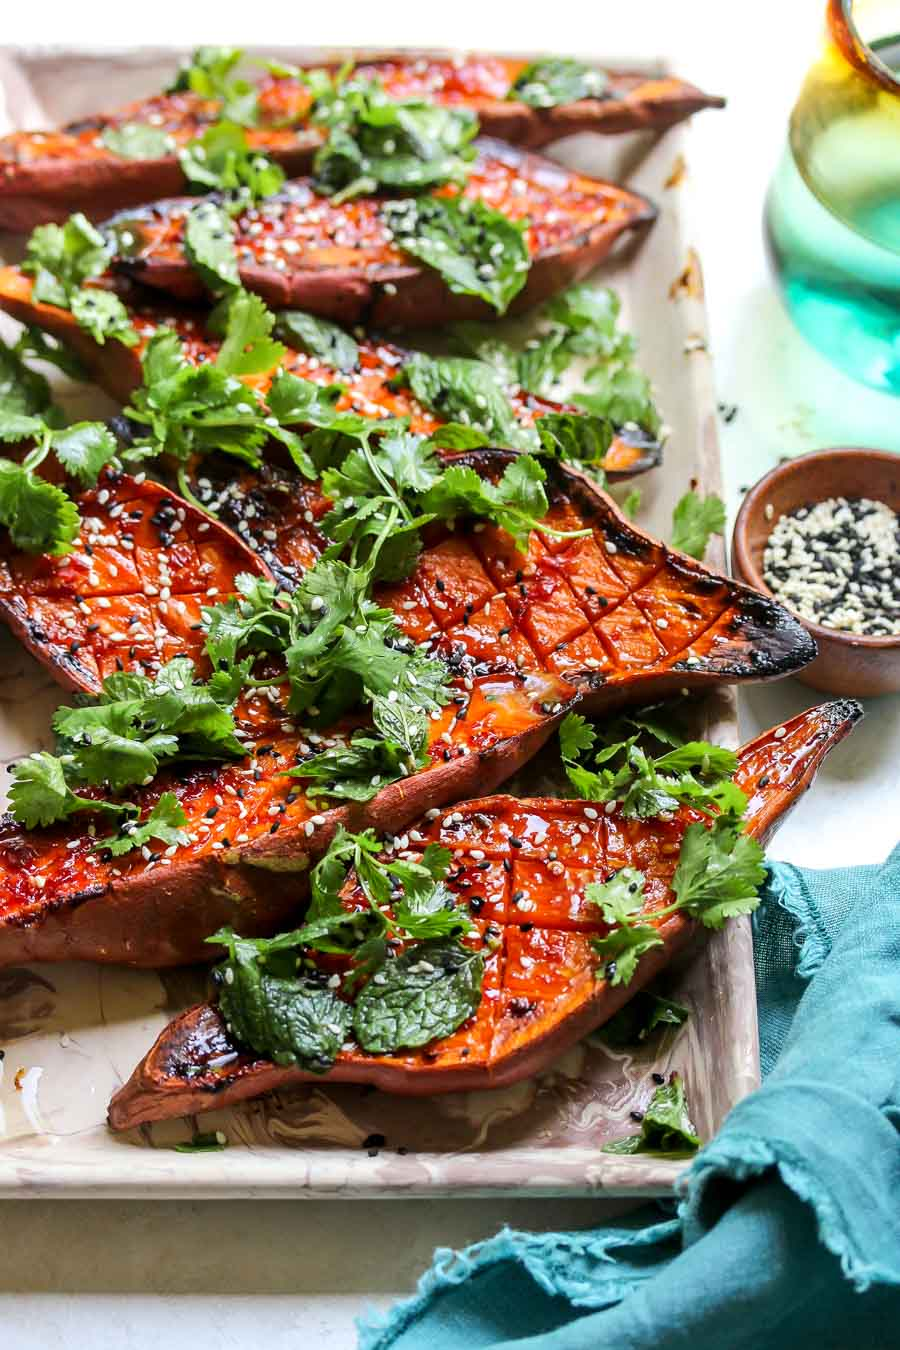 Chile-Glazed Sweet Potatoes with Cilantro Salad